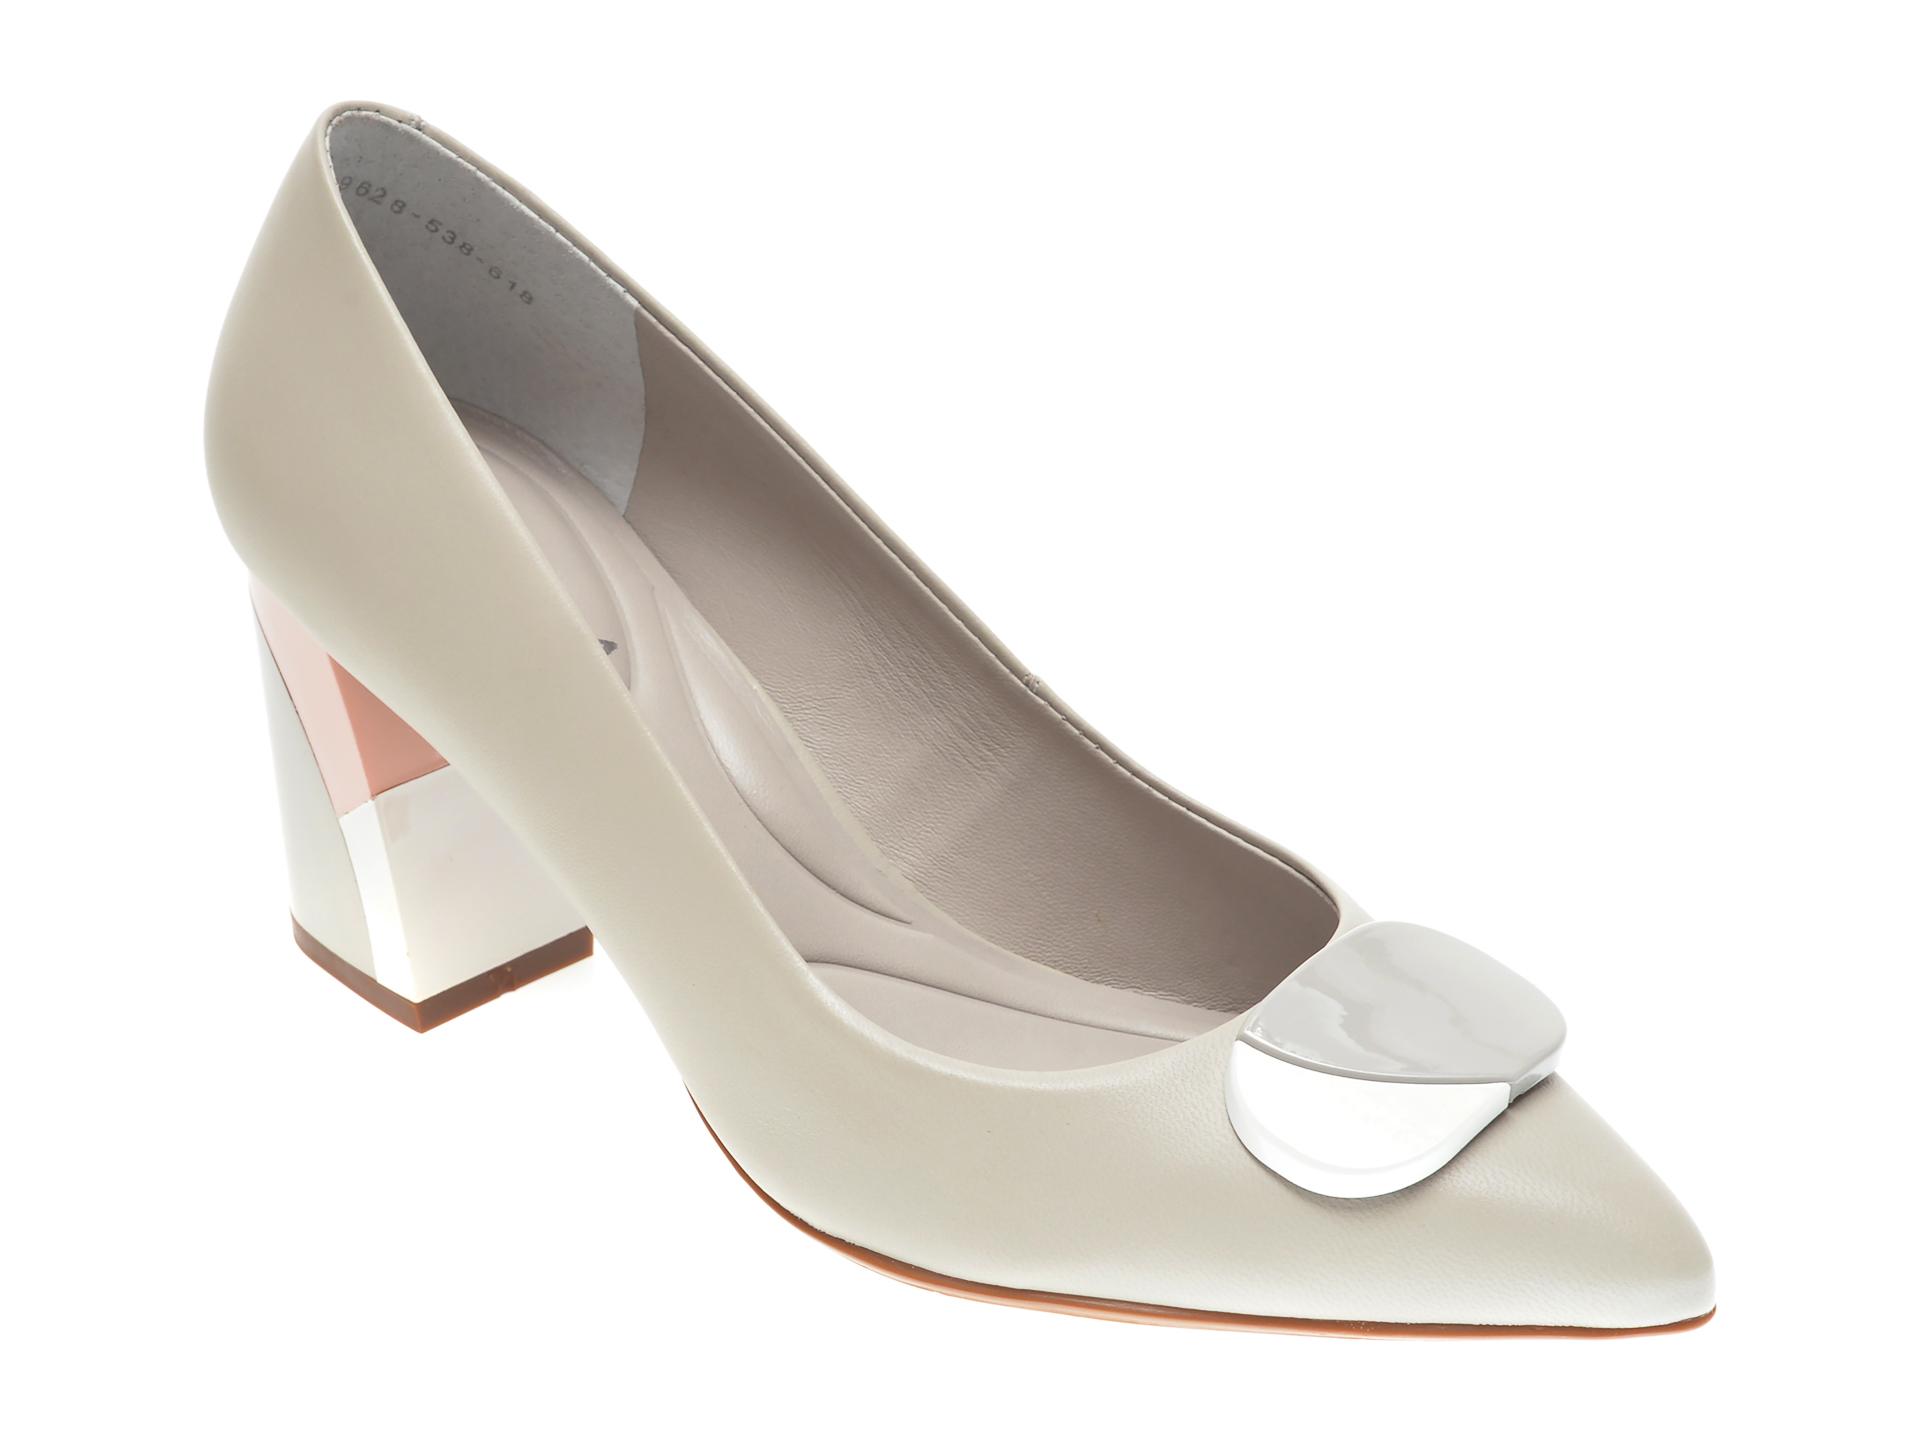 Pantofi EPICA gri, 9628538, din piele naturala imagine